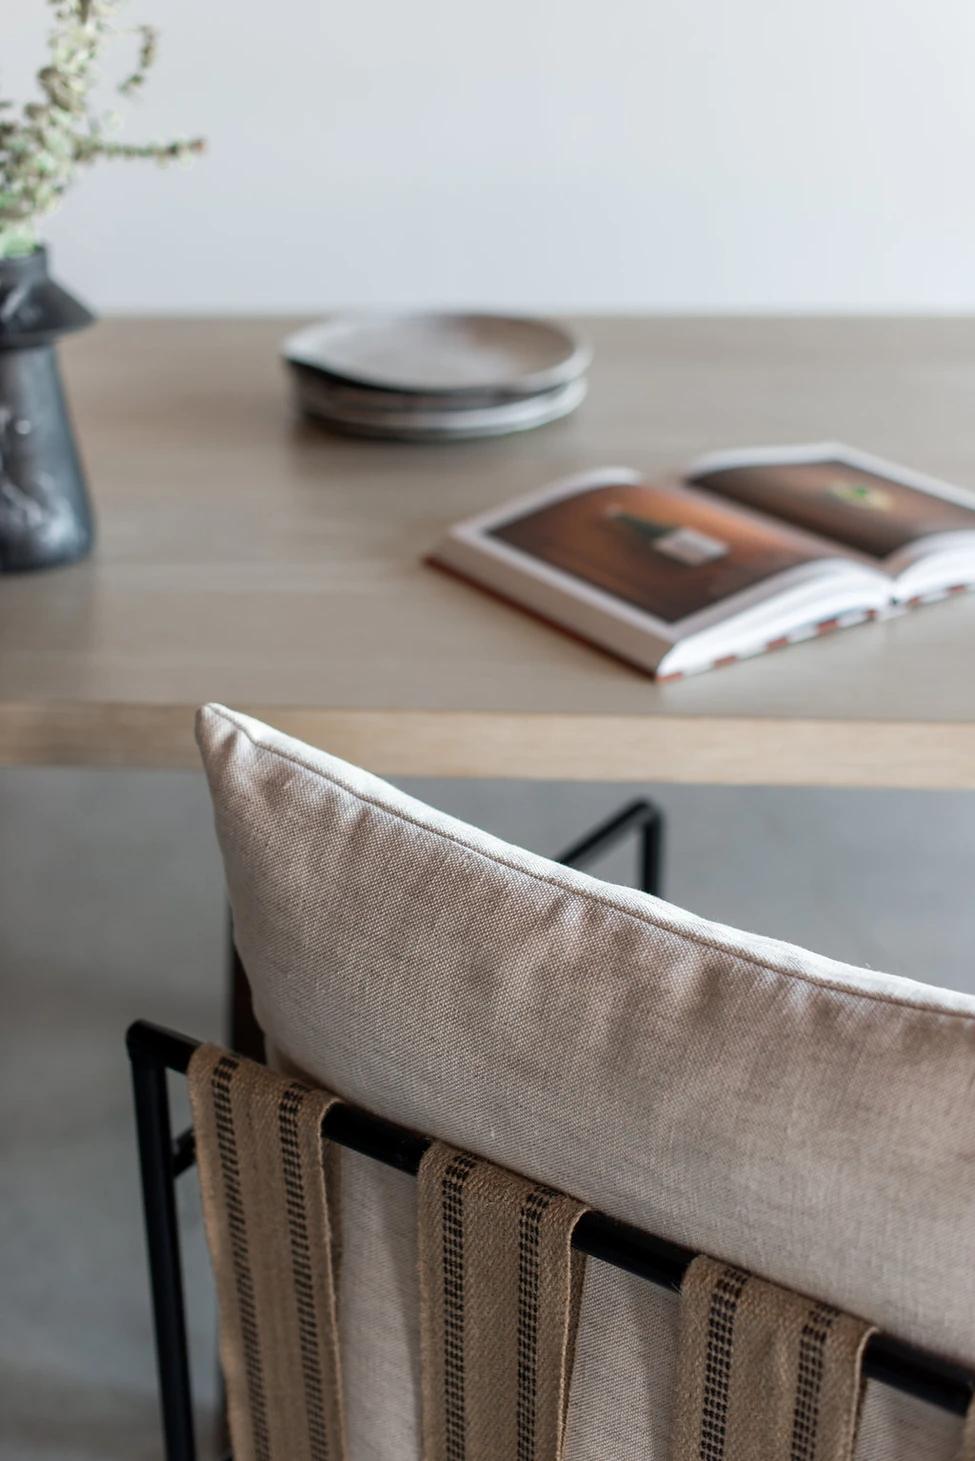 Sierra Dining Chair - Croft House Design Studio - LA, California – CROFT HOUSE